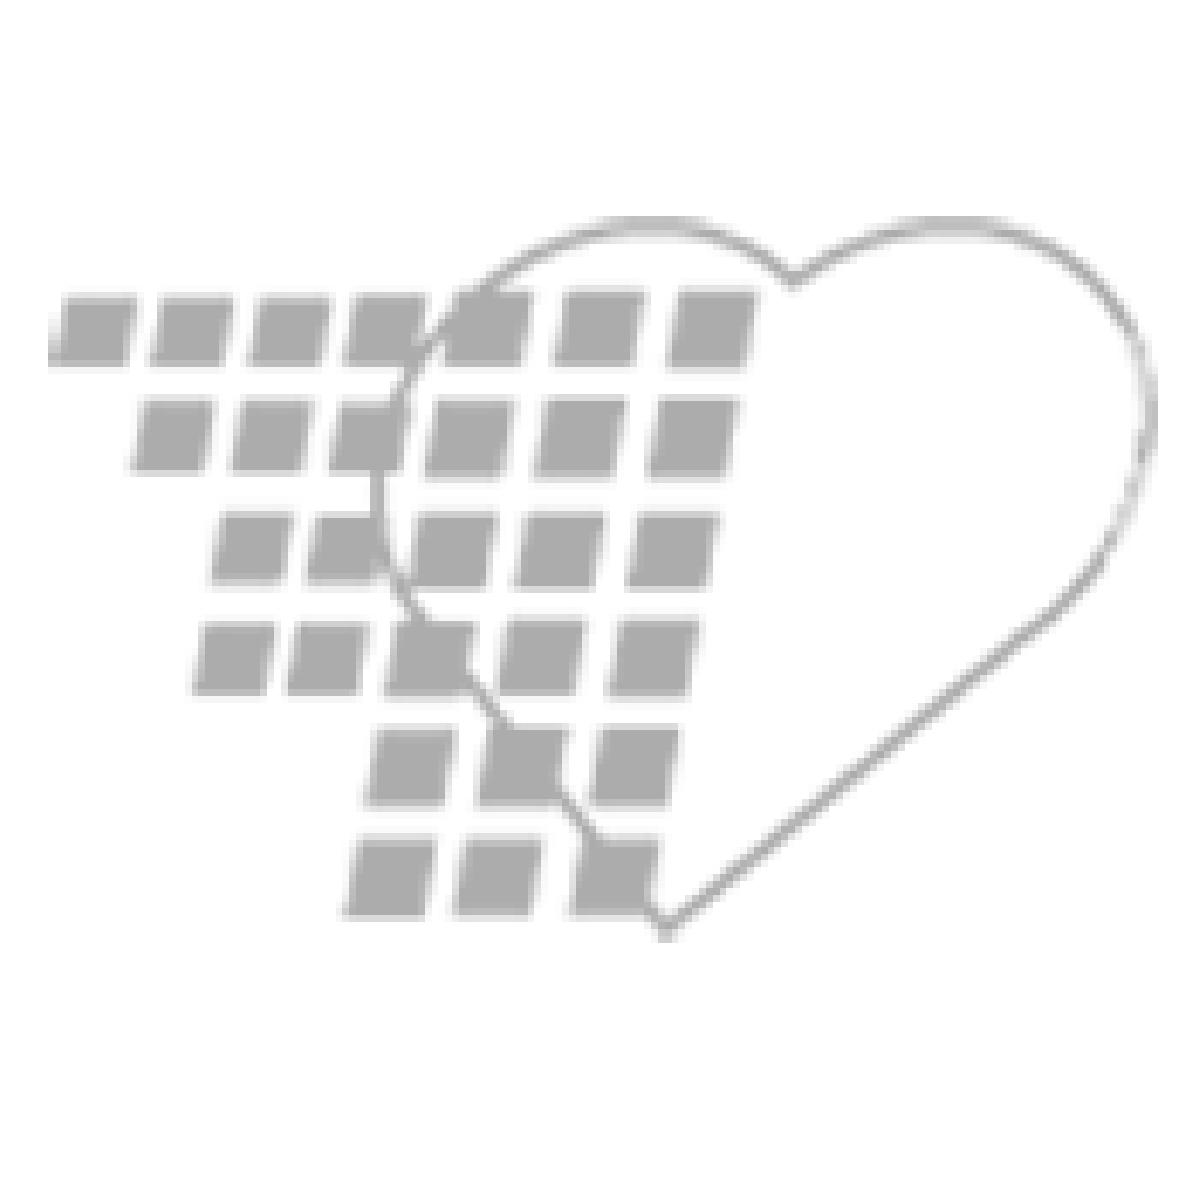 06-93-0424 - Demo Dose® 10% Amino IV Fluid 1000 mL